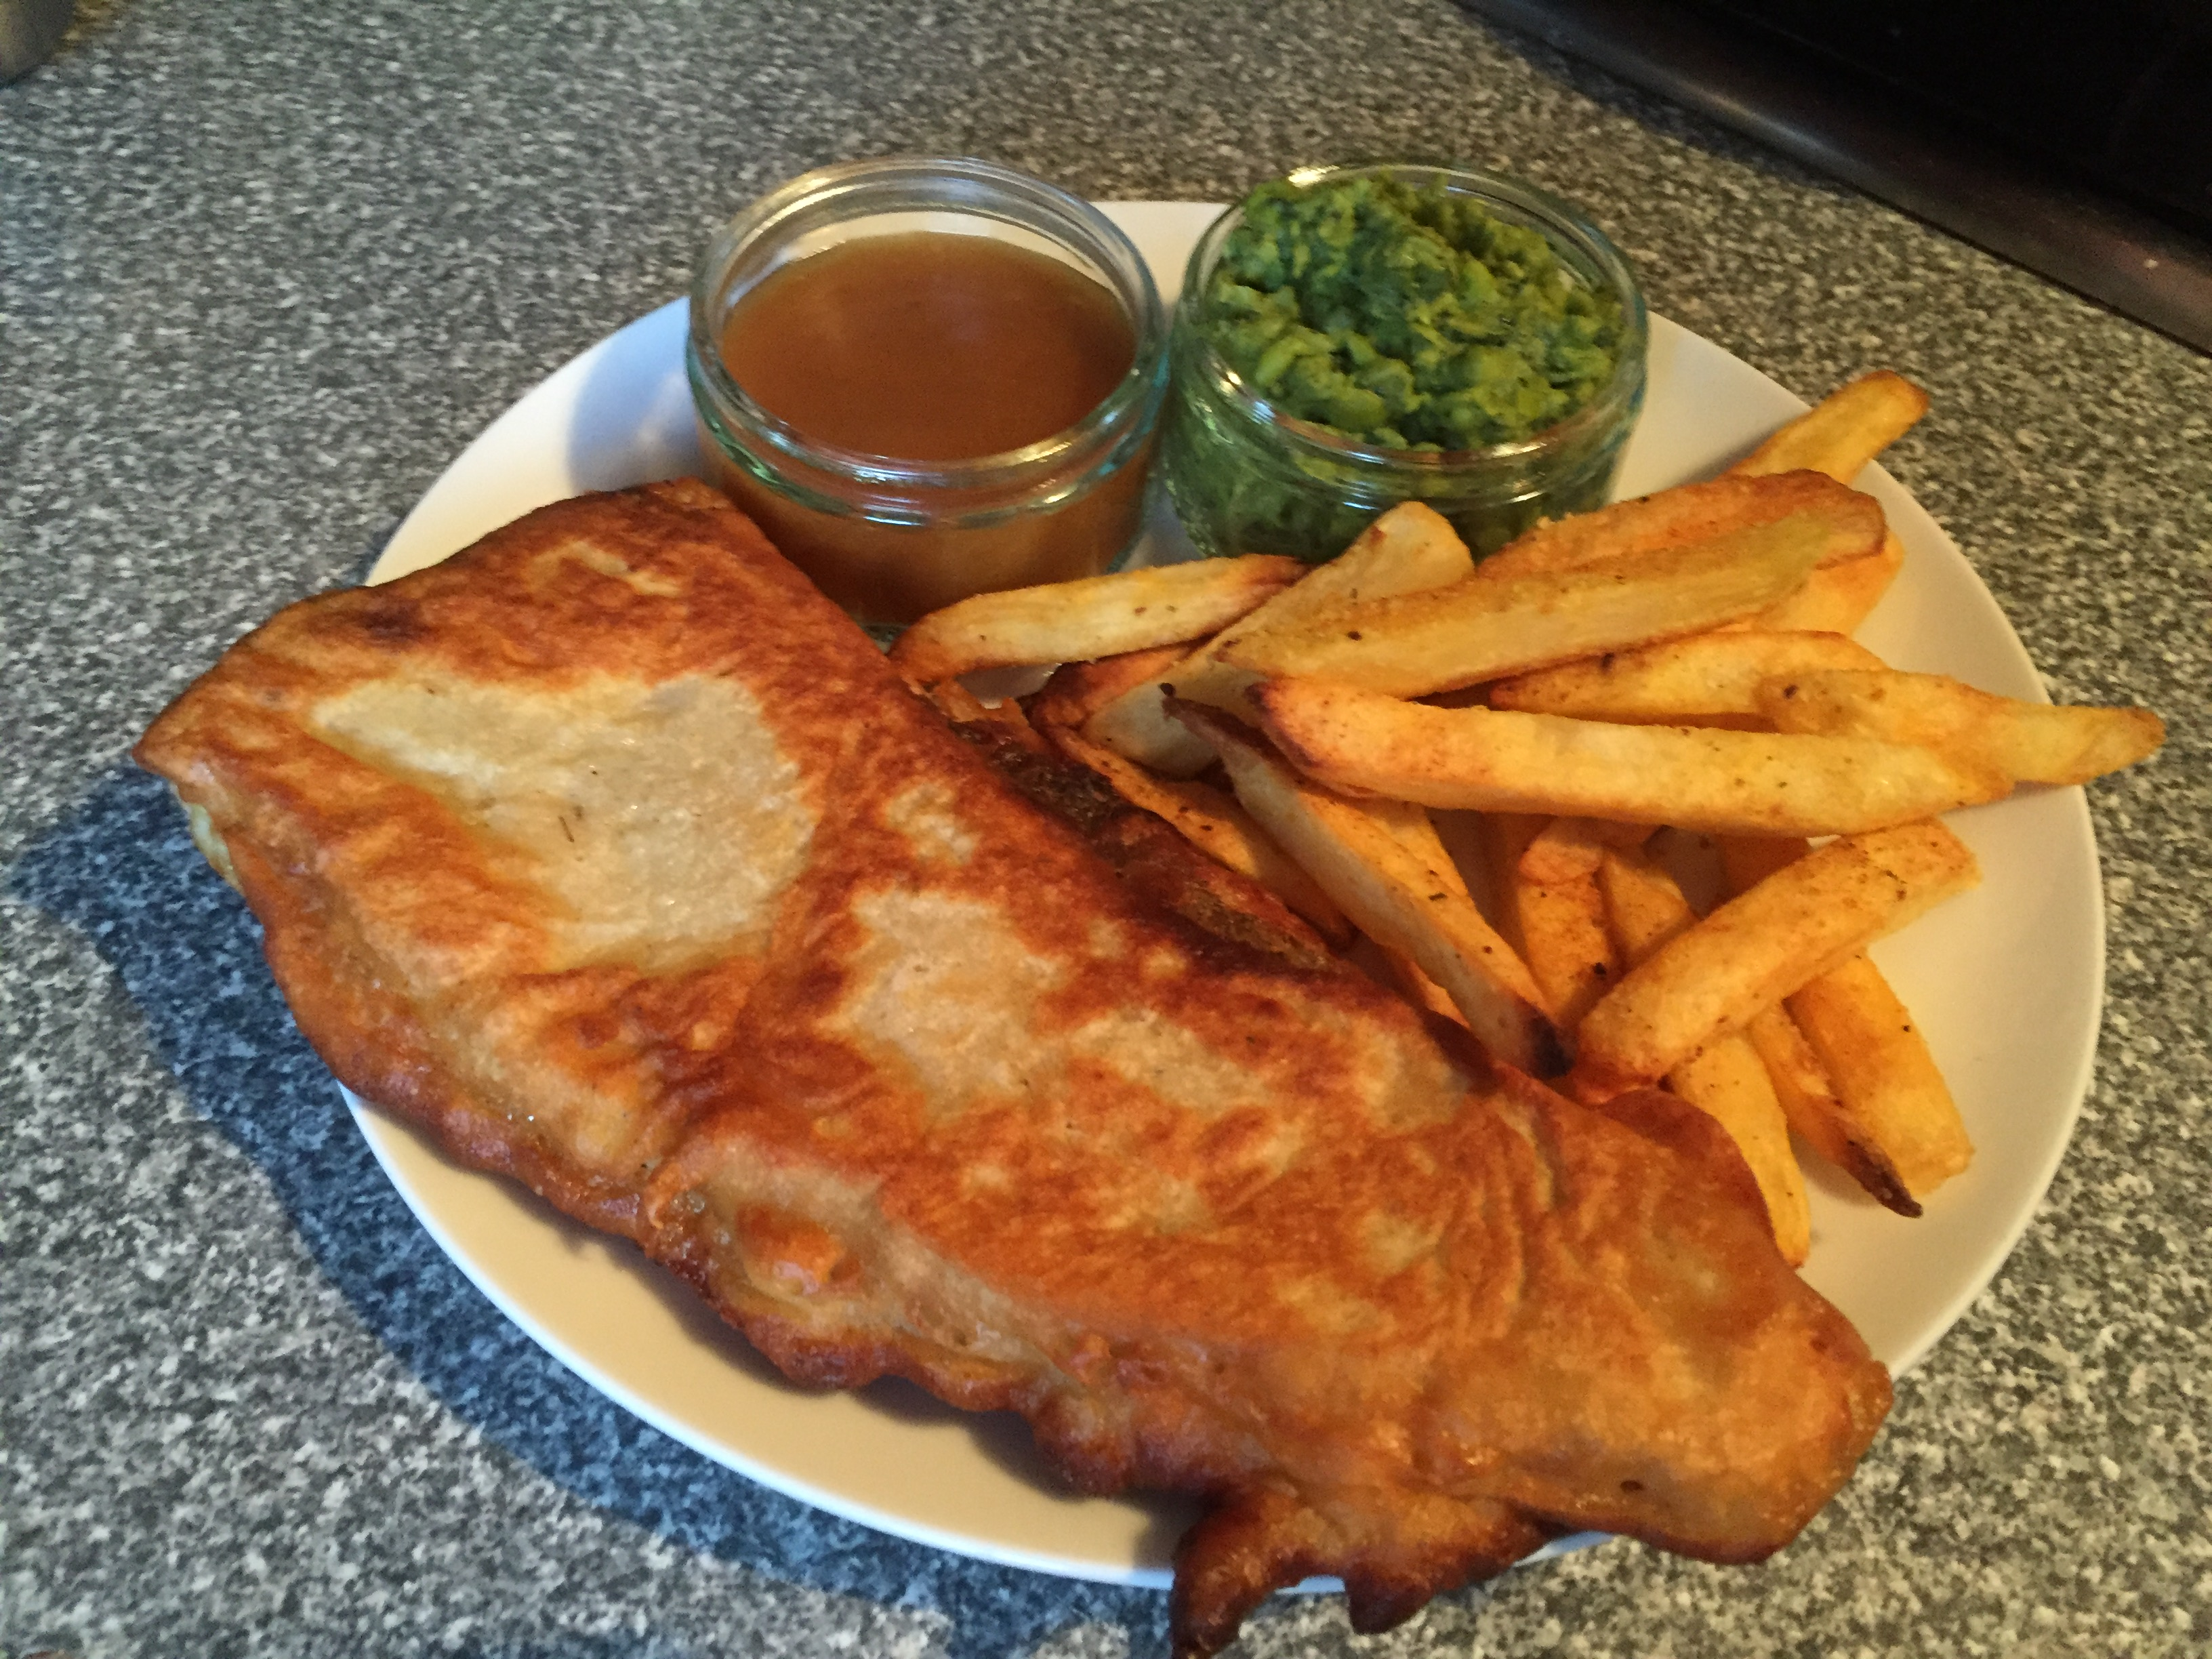 Cod pancake, chips, mushy peas